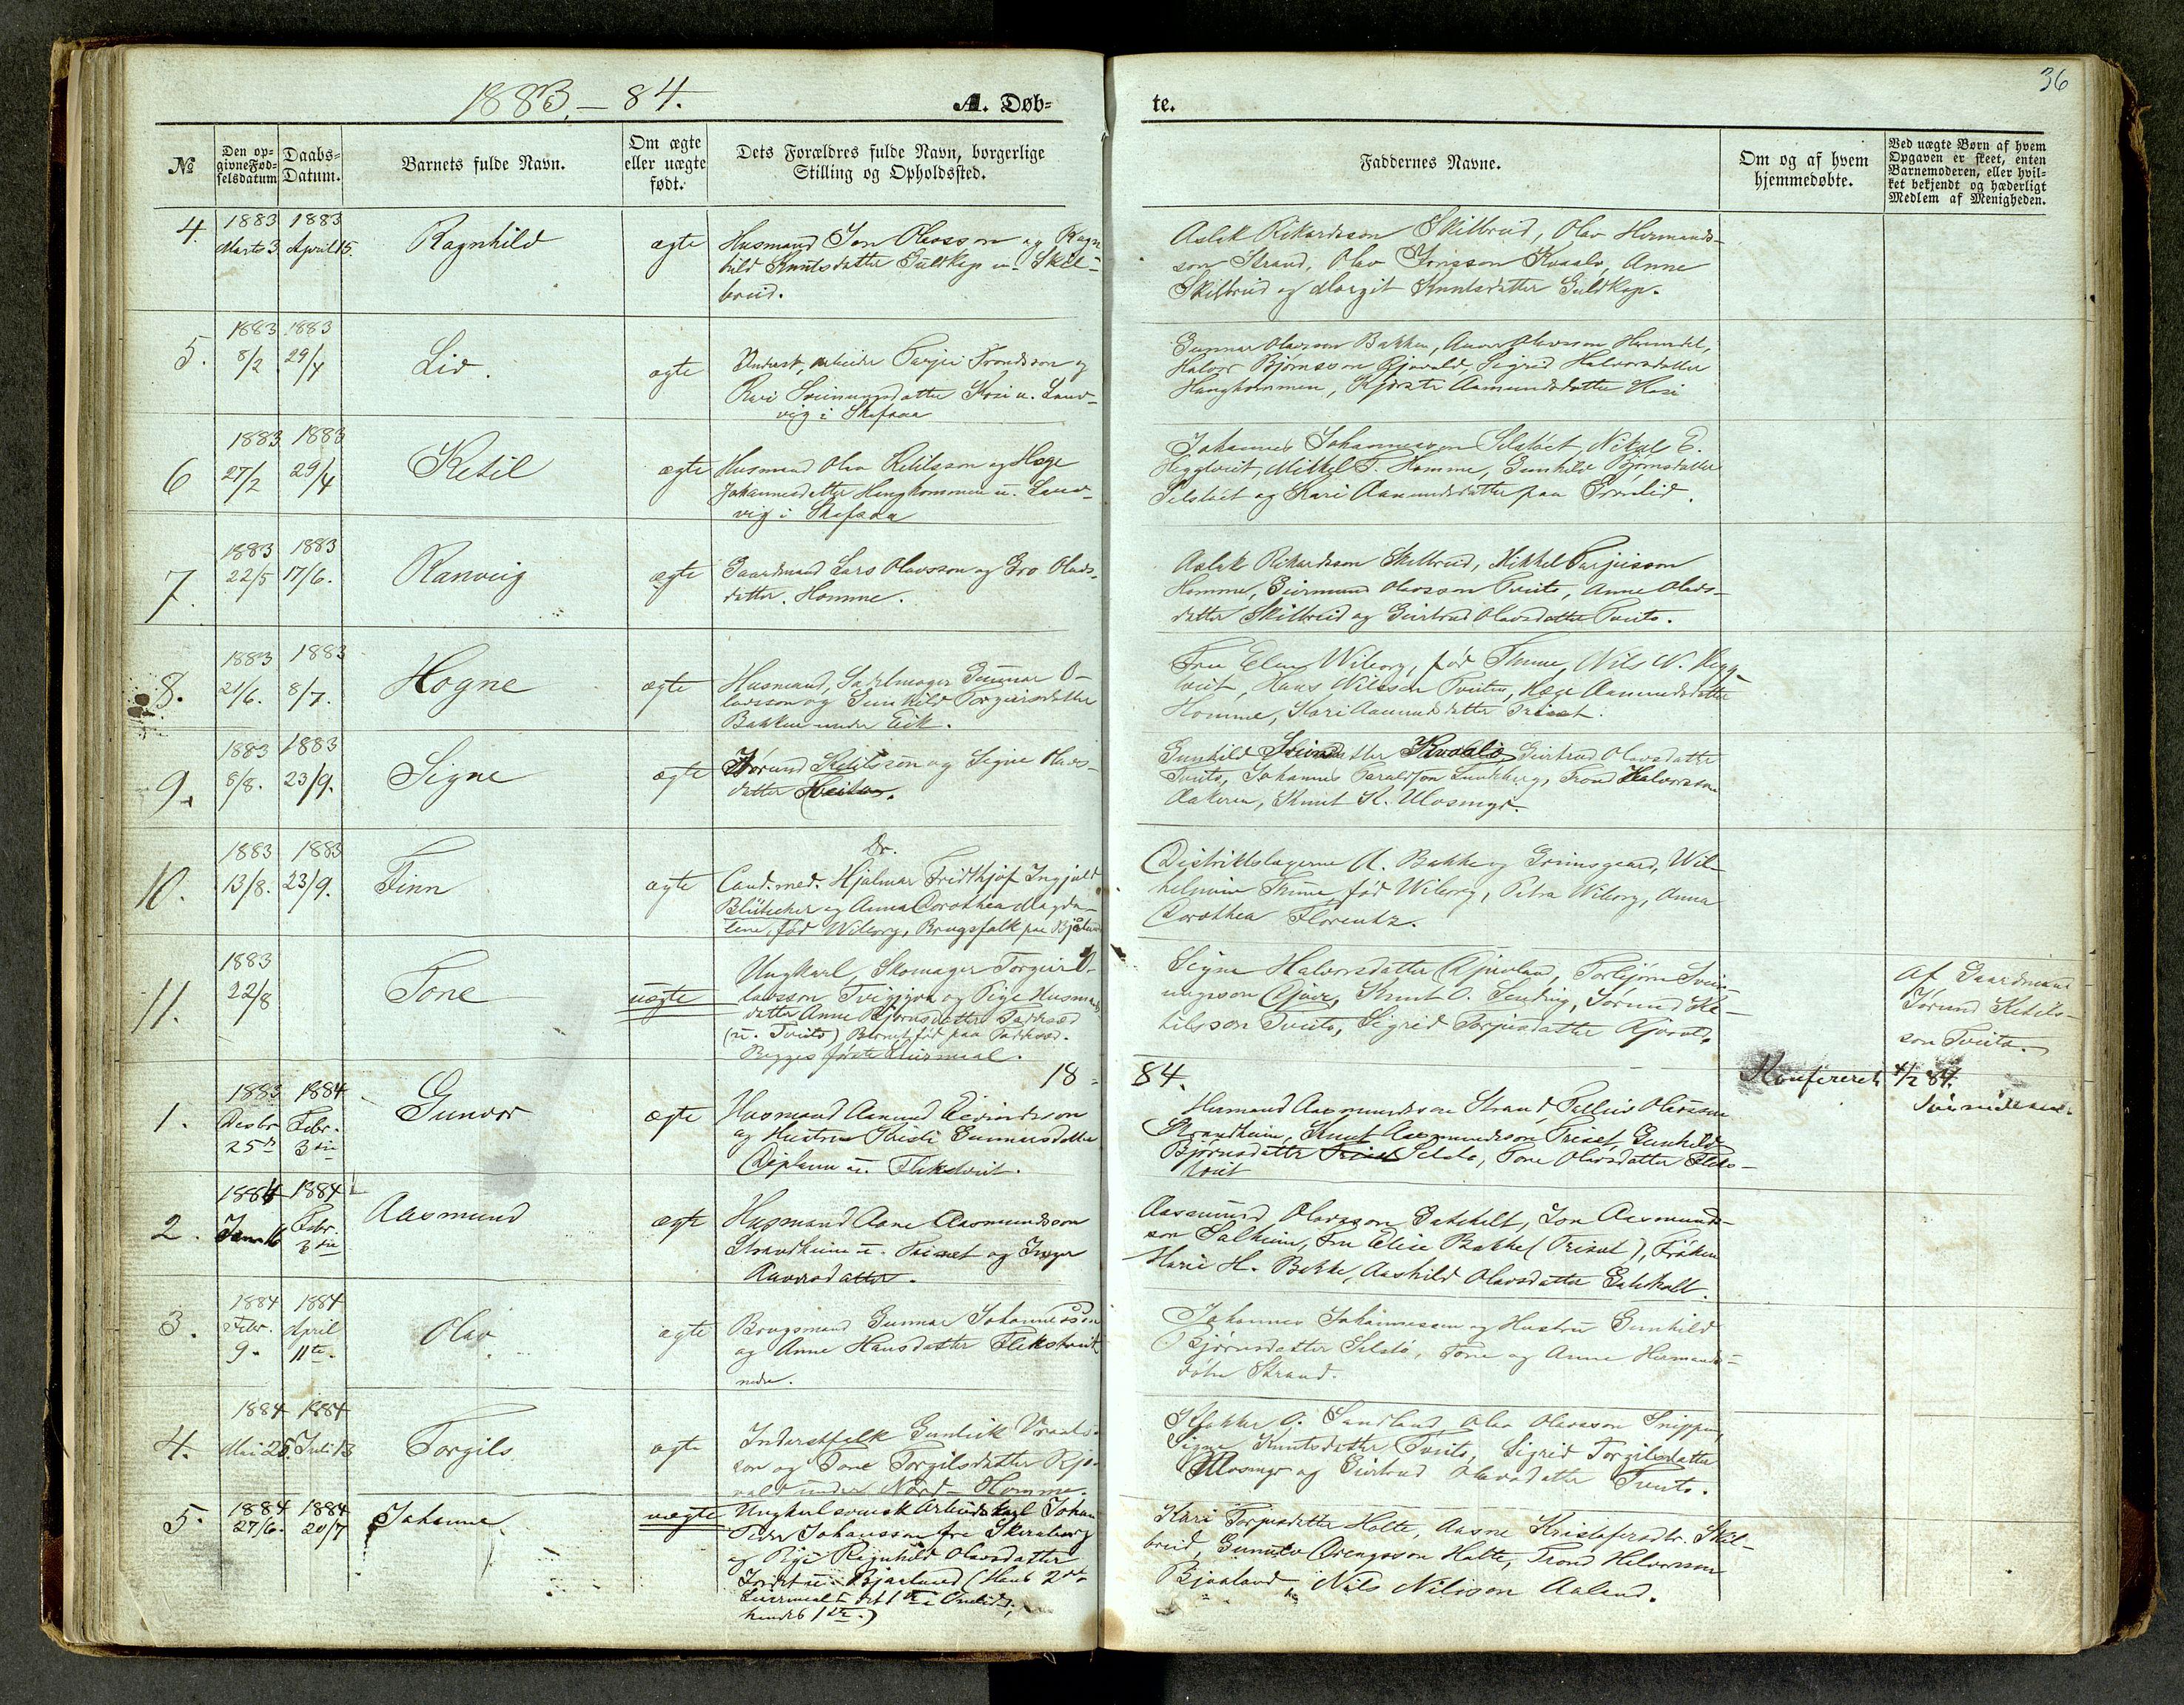 SAKO, Lårdal kirkebøker, G/Ga/L0002: Klokkerbok nr. I 2, 1861-1890, s. 36